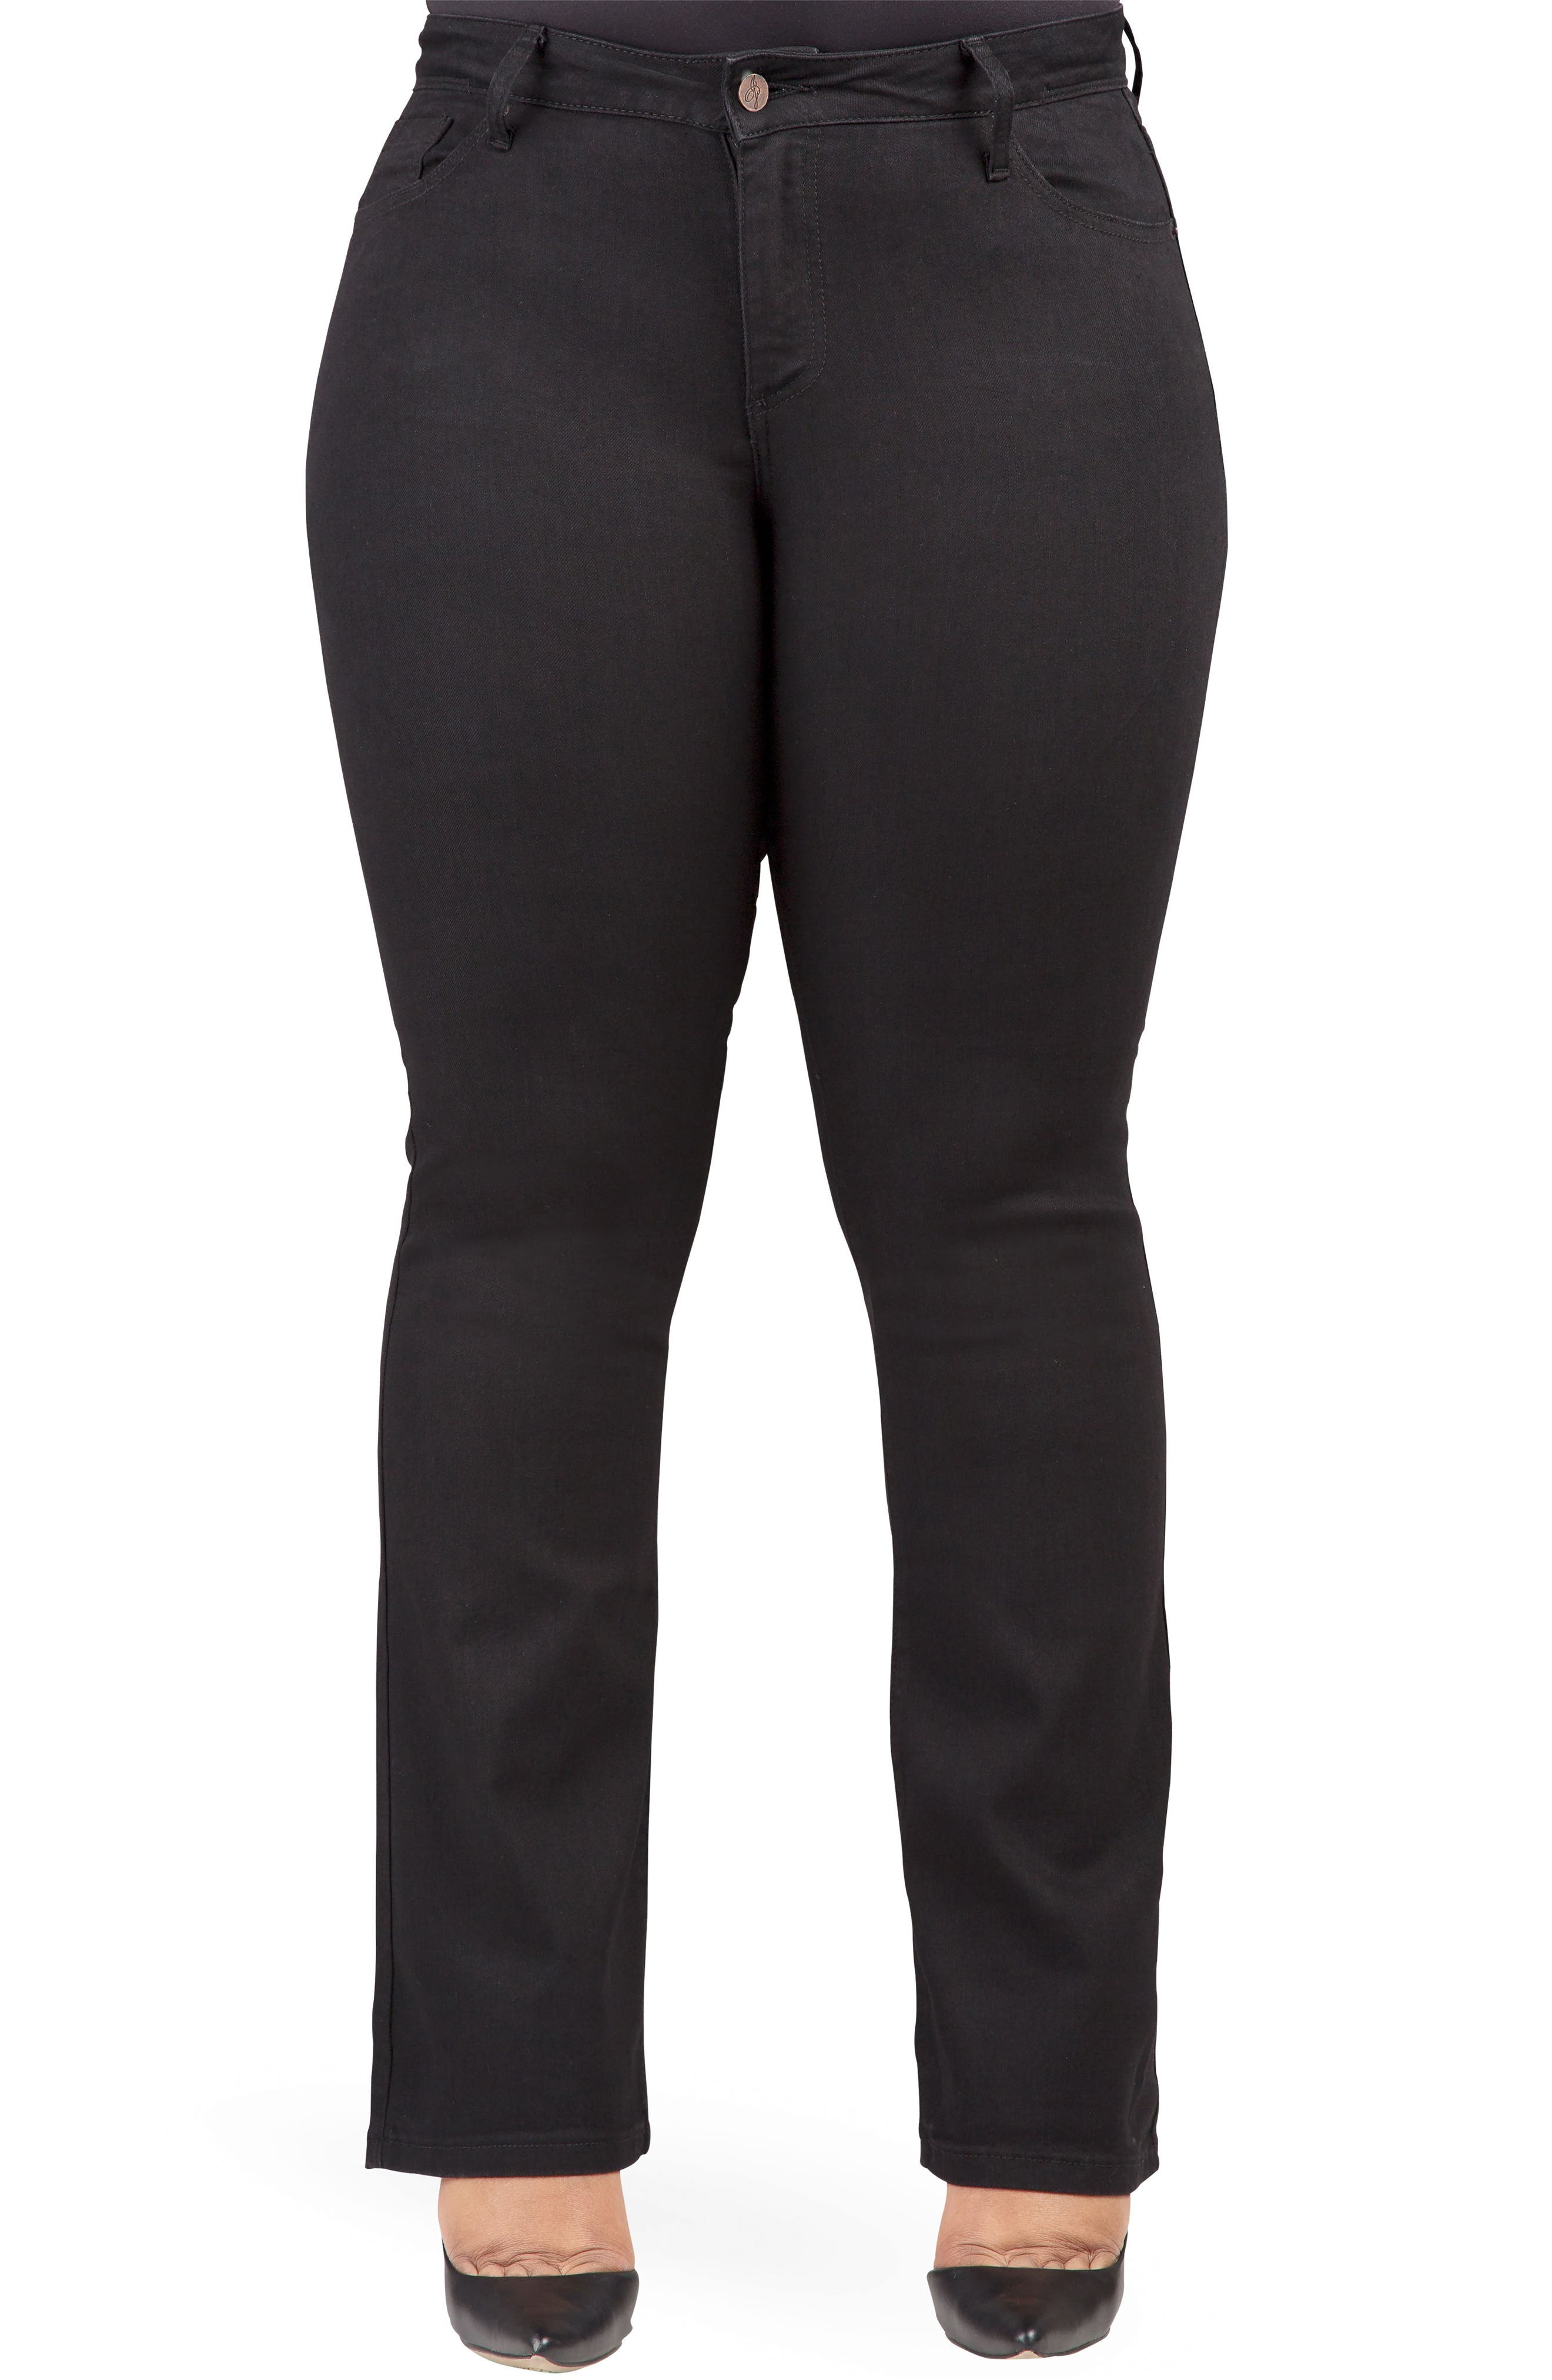 Plus Women's Poetic Justice Scarlett Slim Bootcut Curvy Fit Jeans